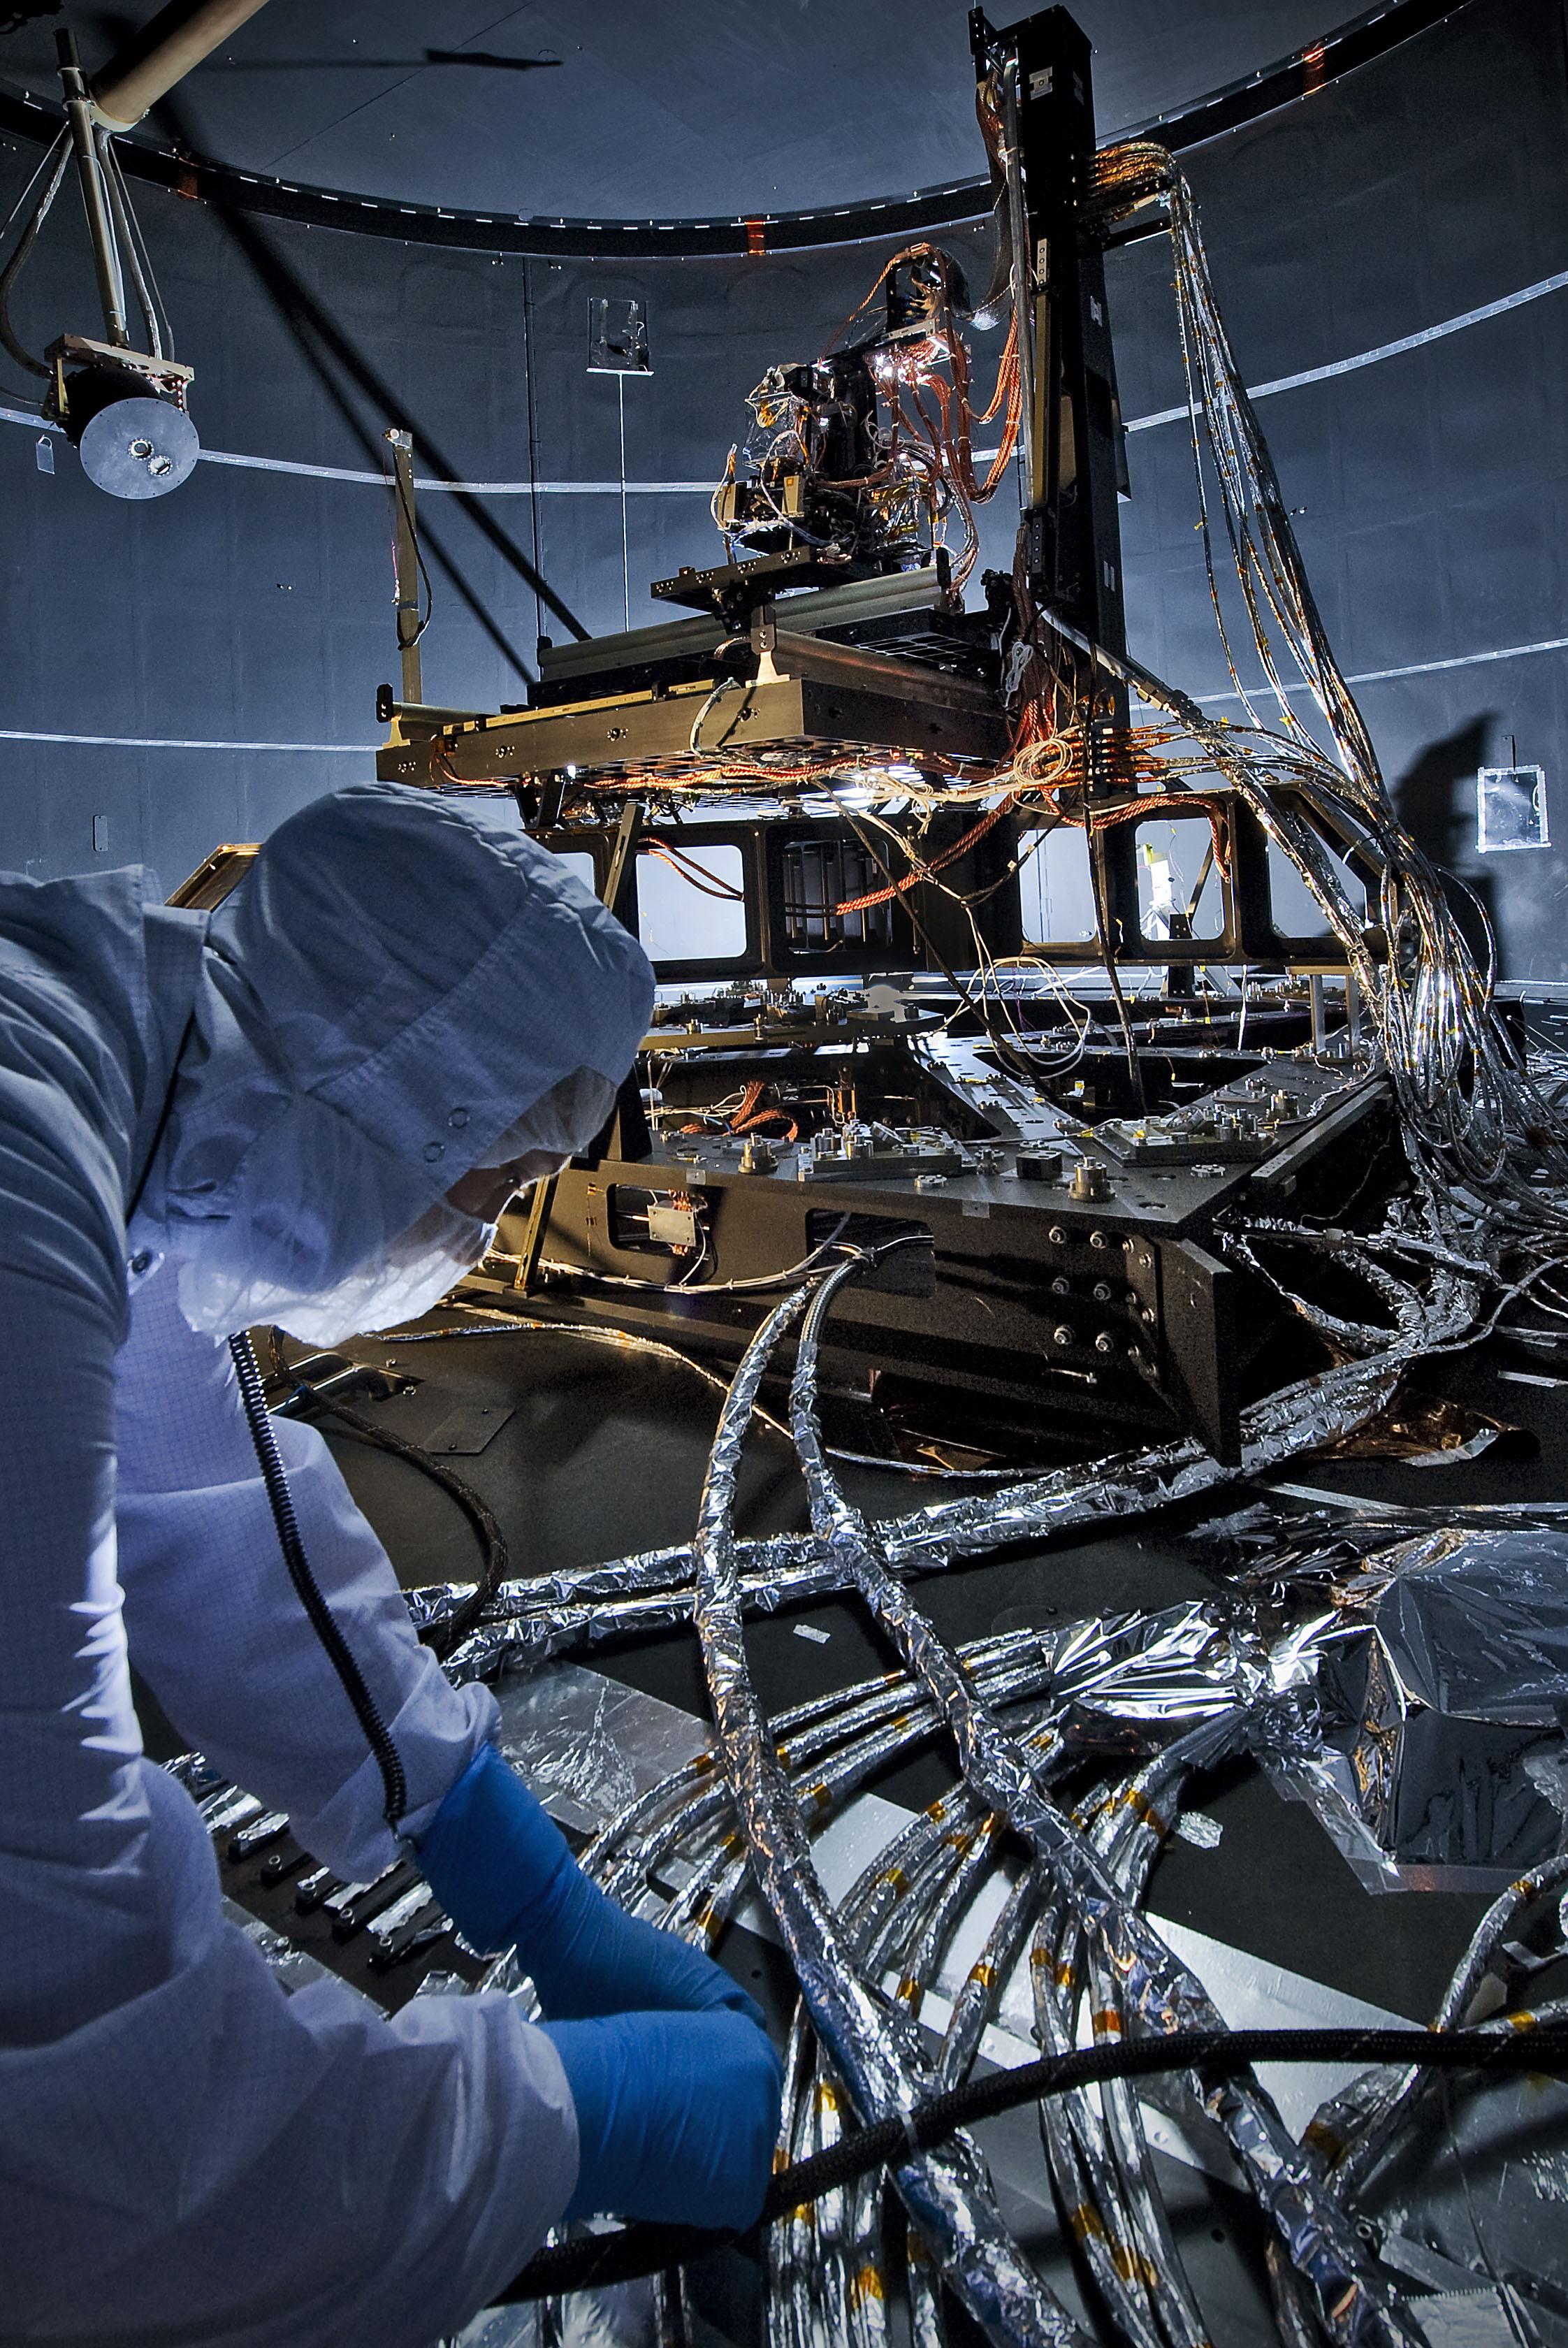 James Webb Space Telescope 187 Iso50 Blog The Blog Of